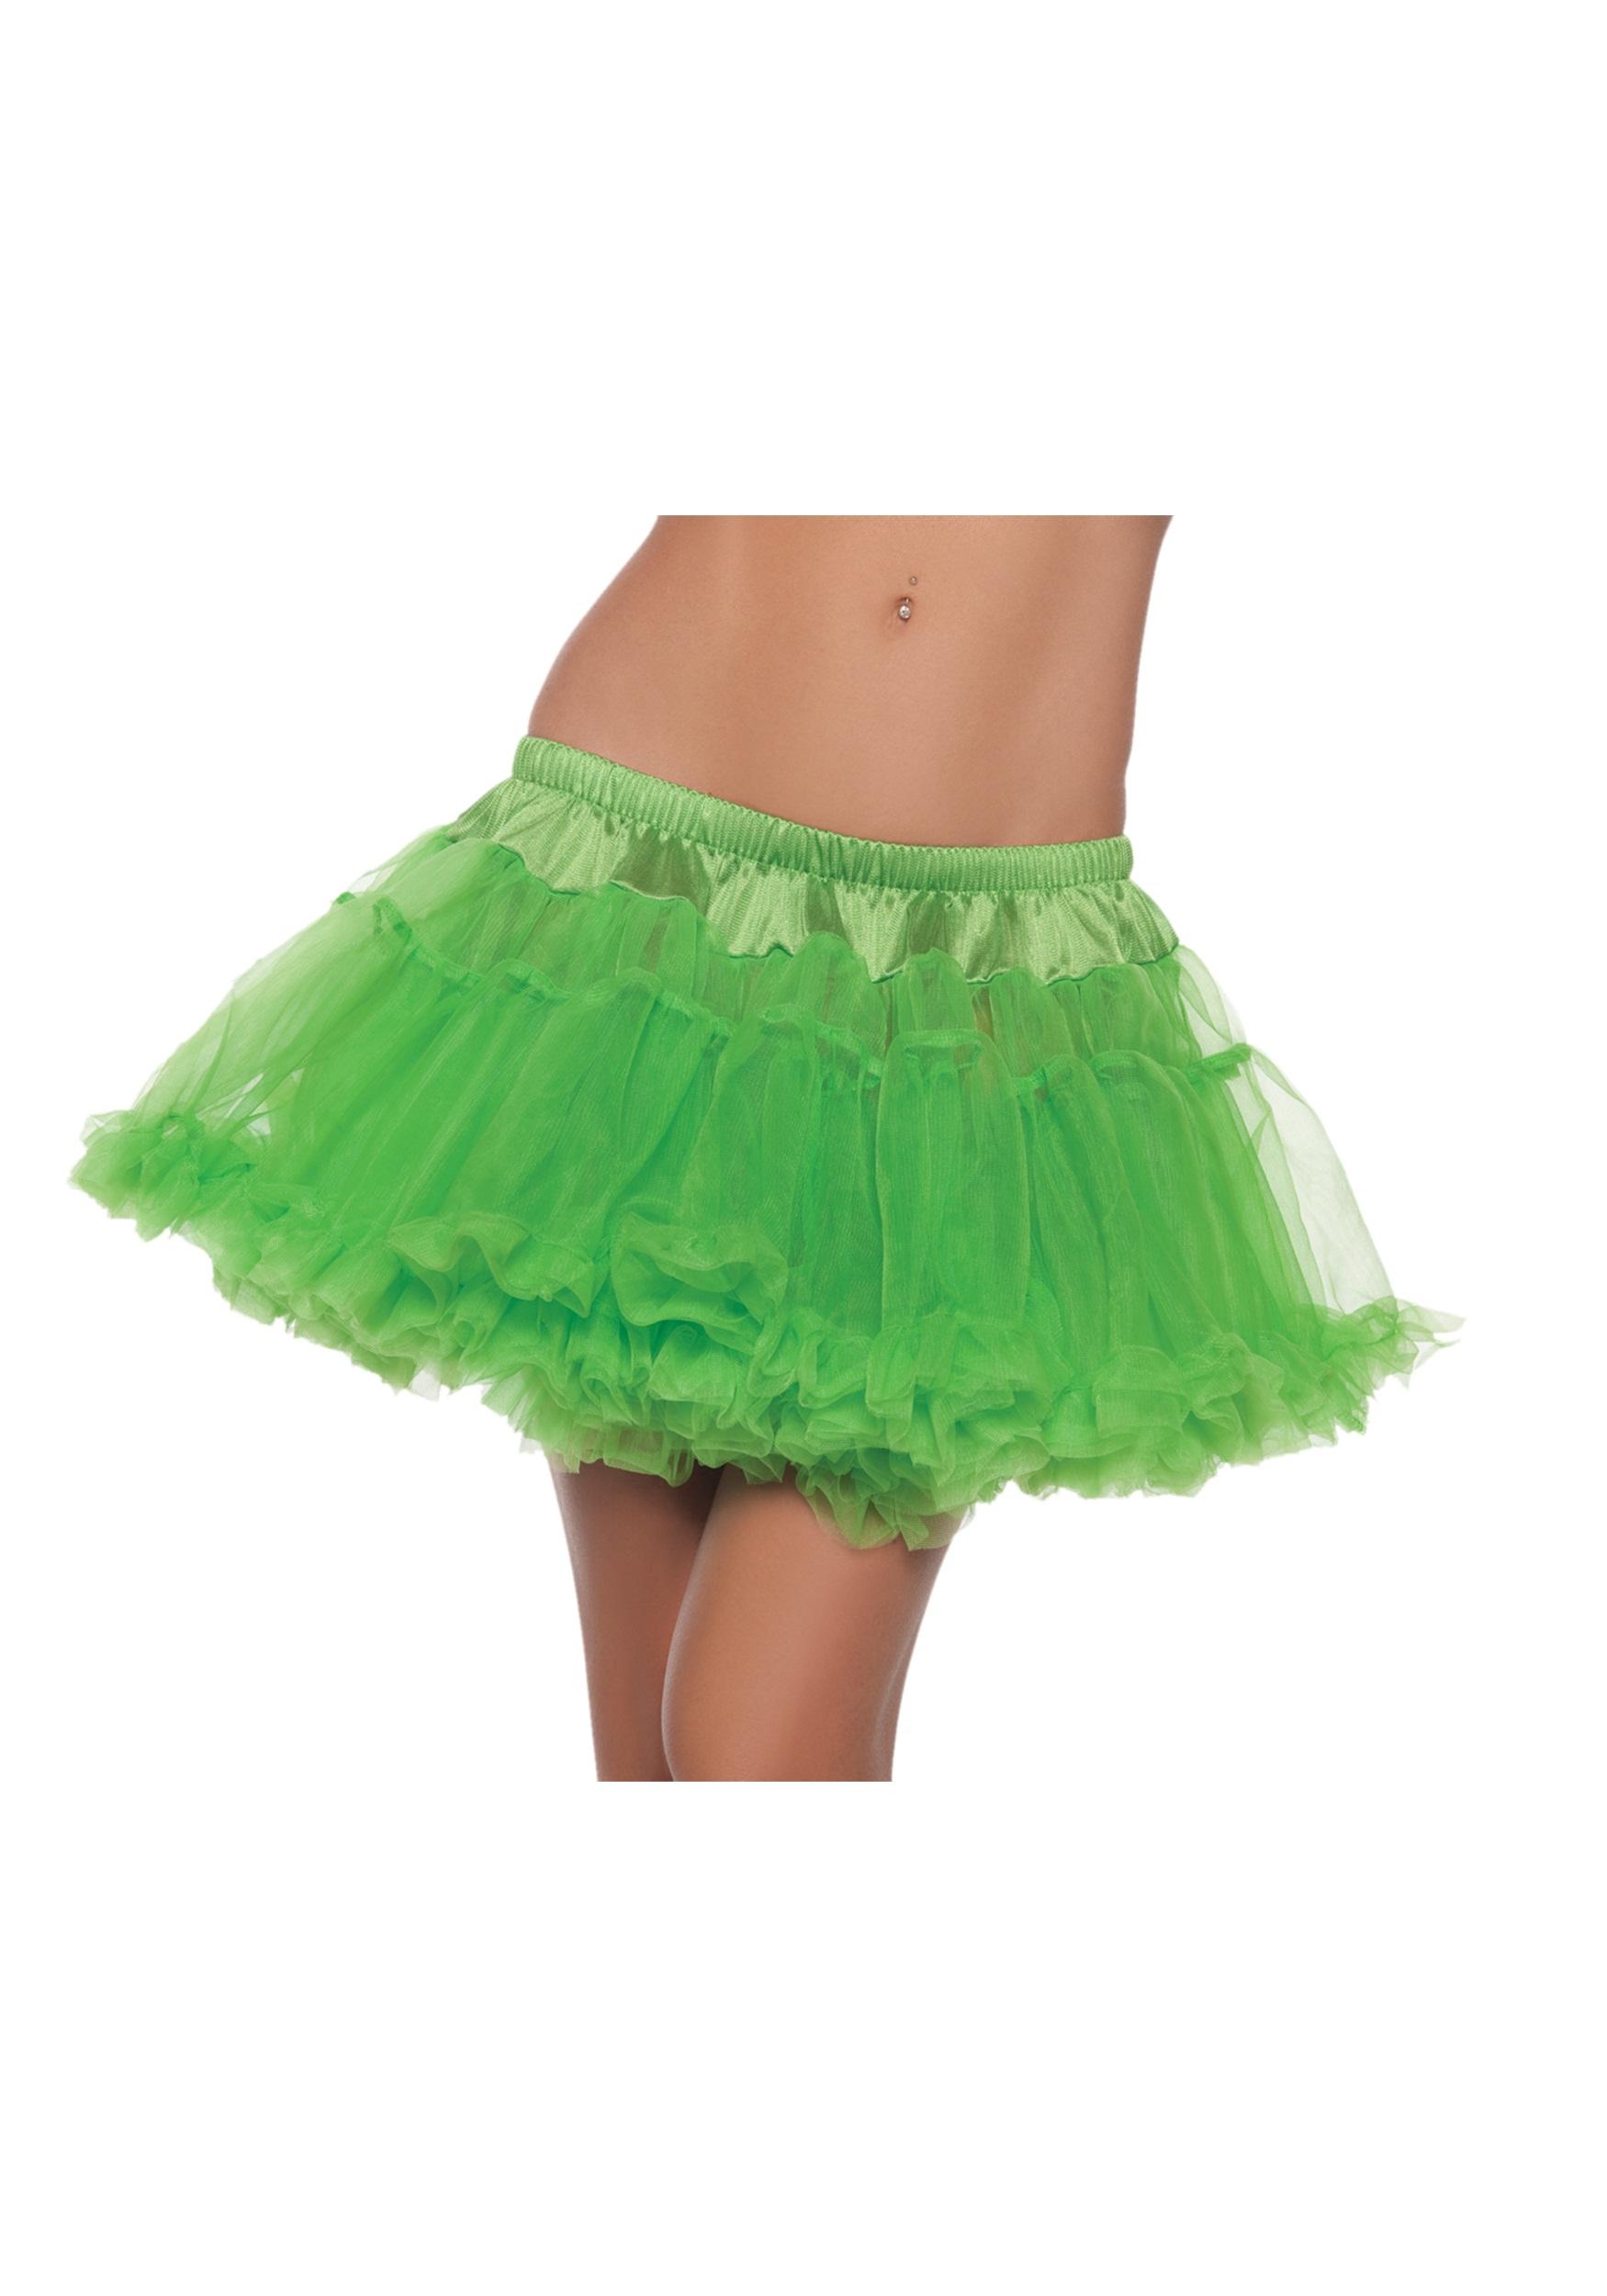 Green_Petticoat_Accessory_for_Women